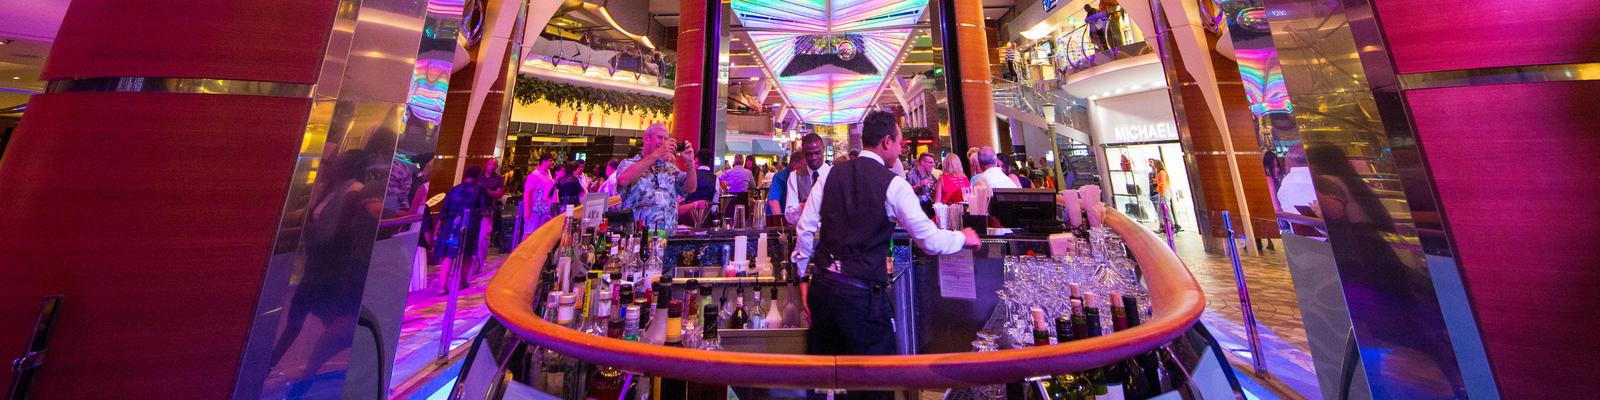 Rising Tide Bar on Oasis of the Seas (Photo: Cruise Critic)